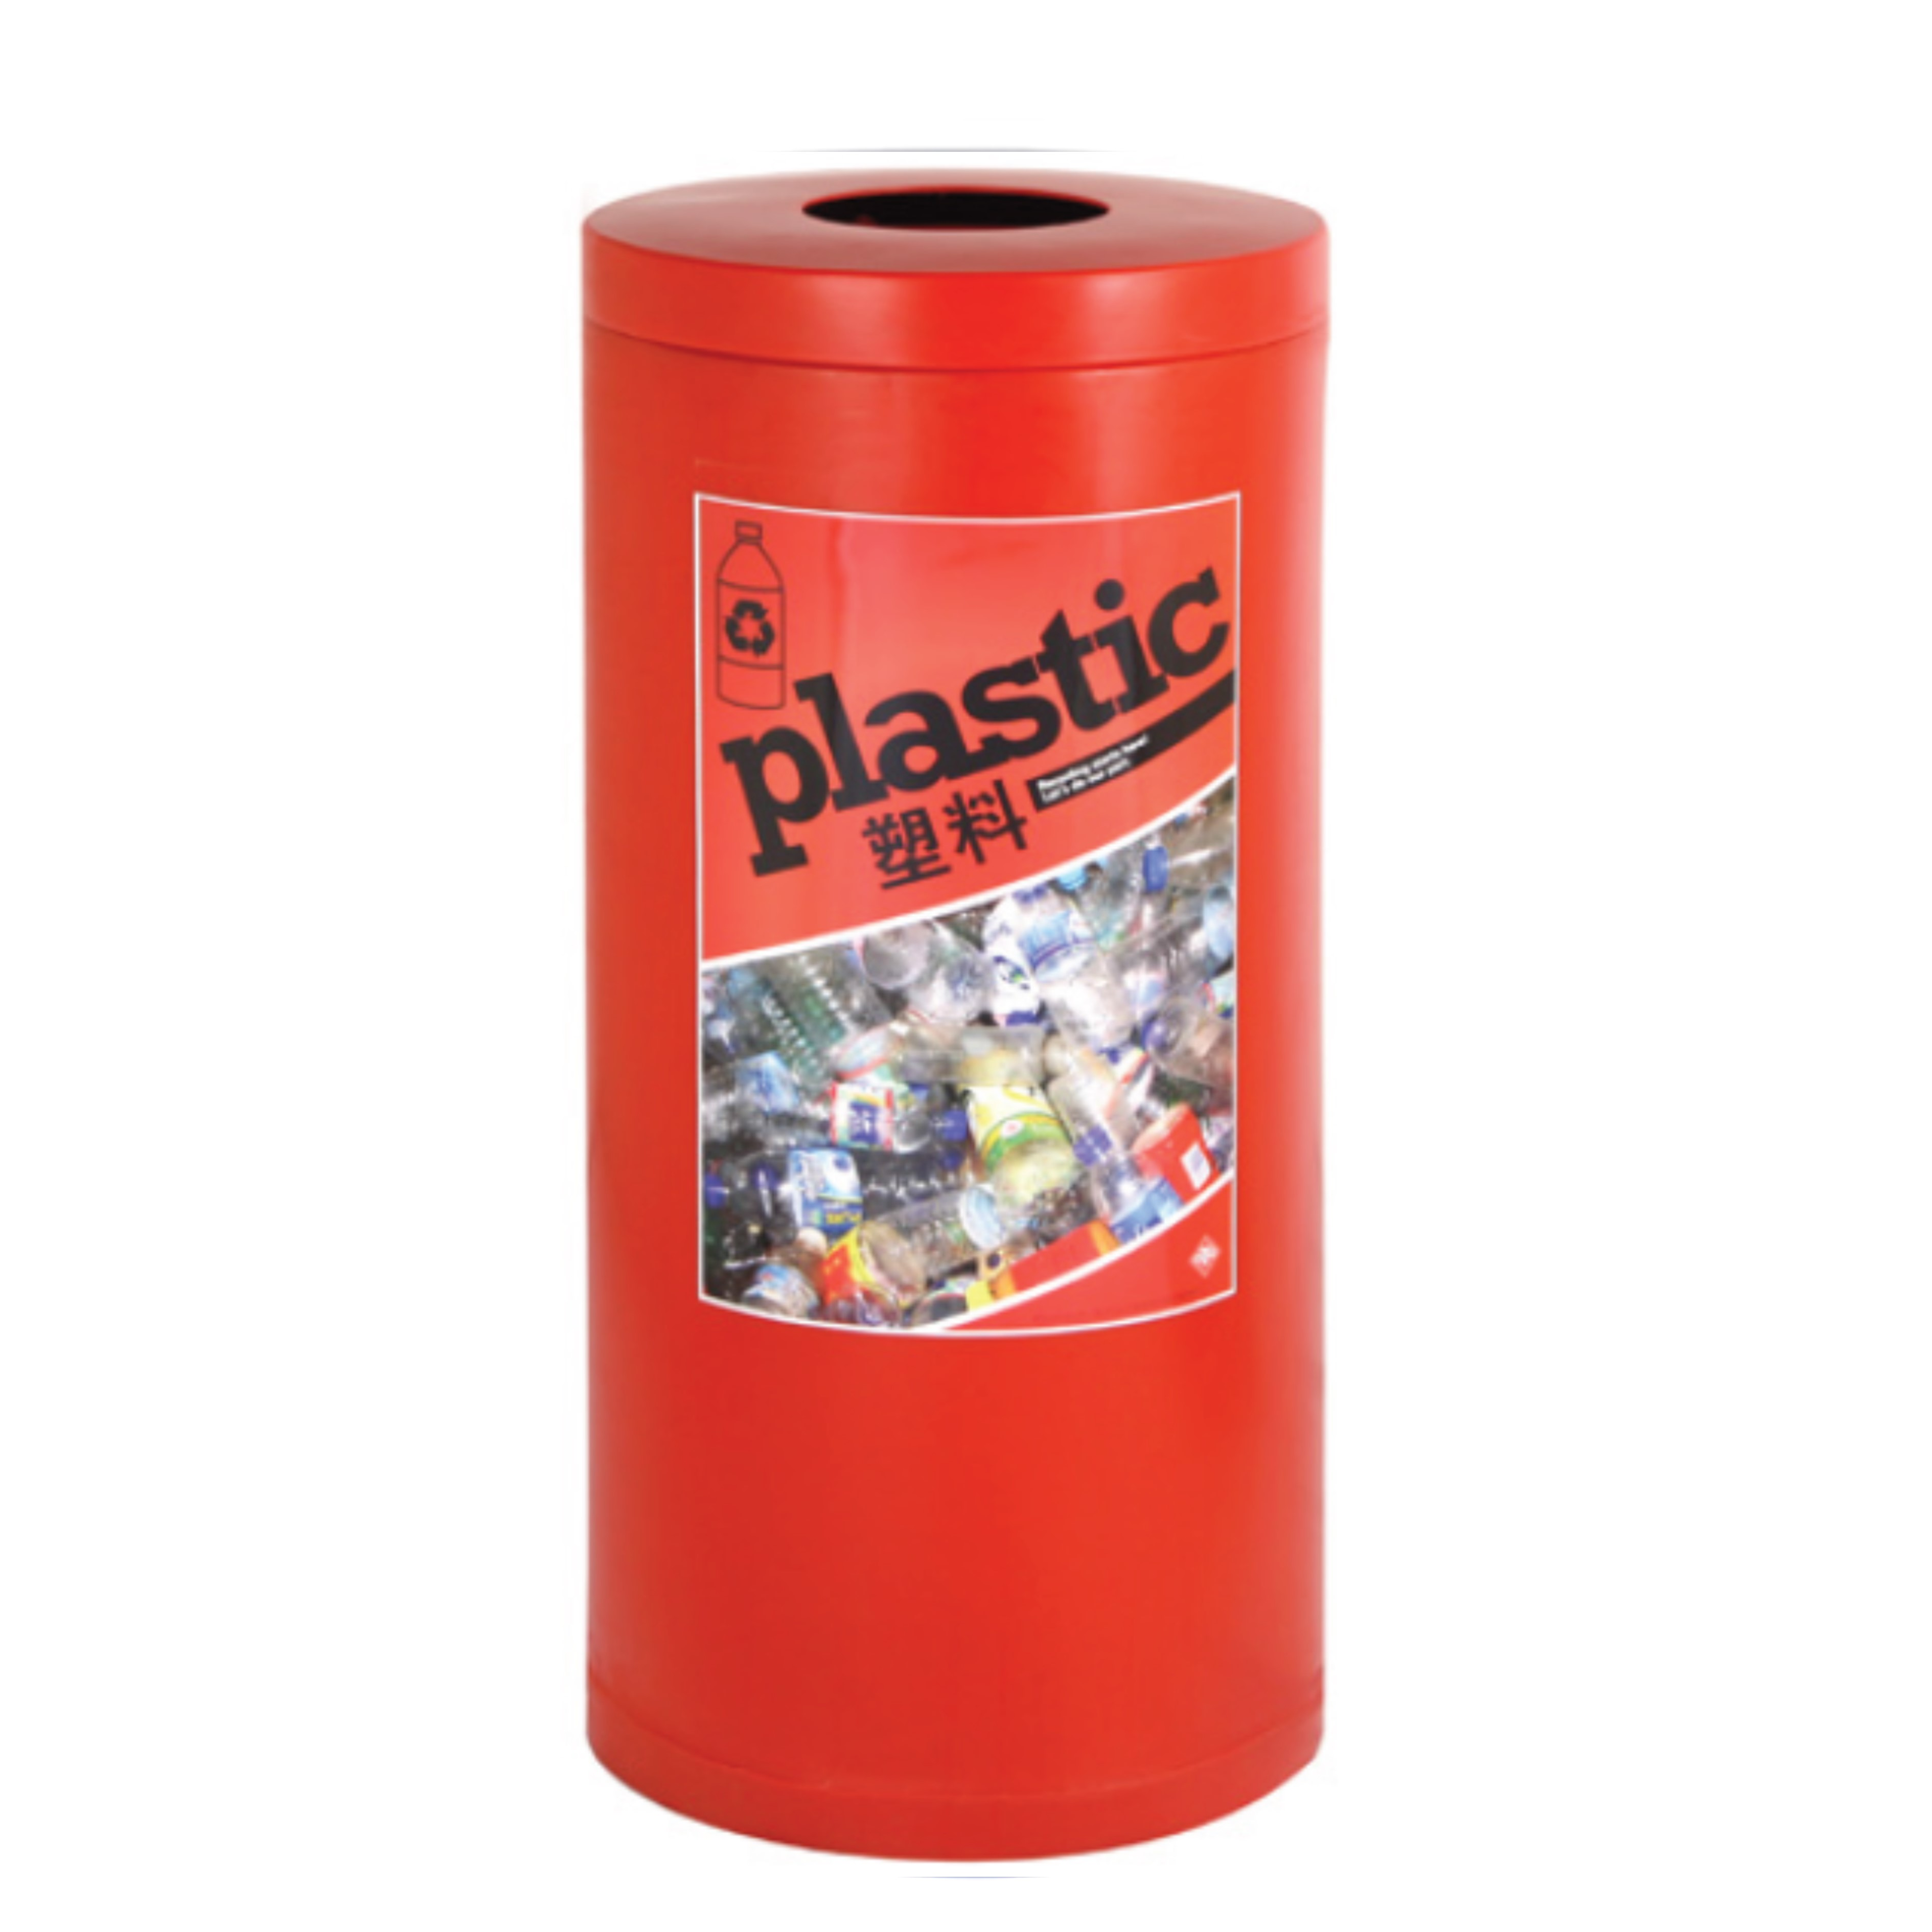 NAS - PLASTIC